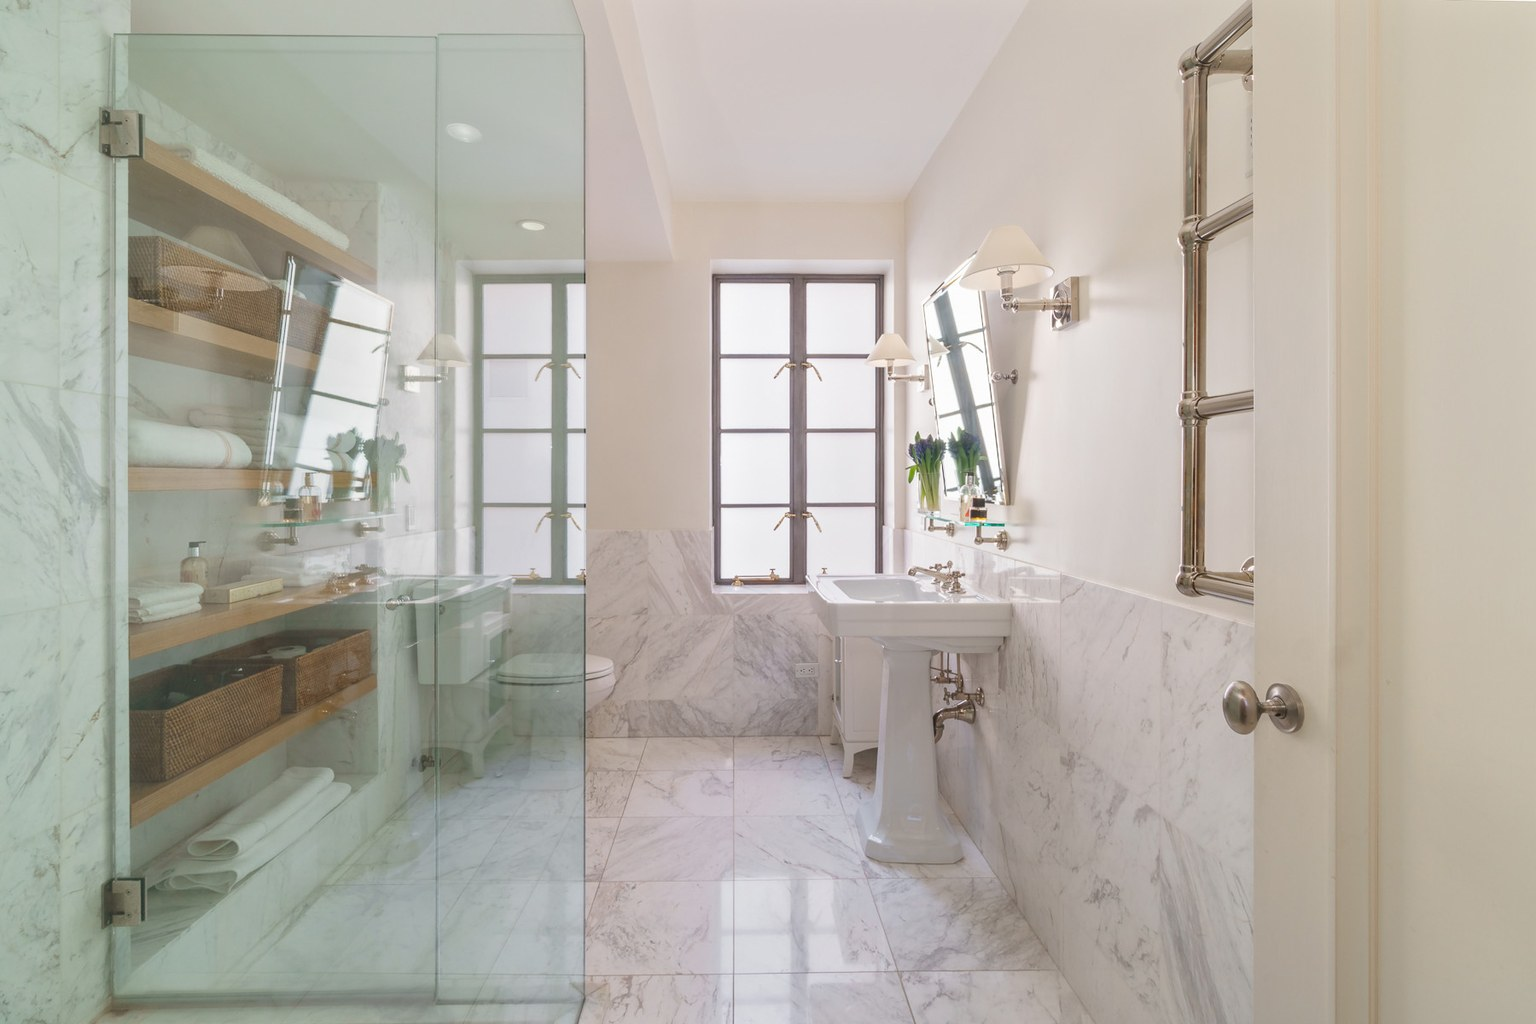 Ina Garten House celebrity homes: ina garten's apartment & why she's my secret